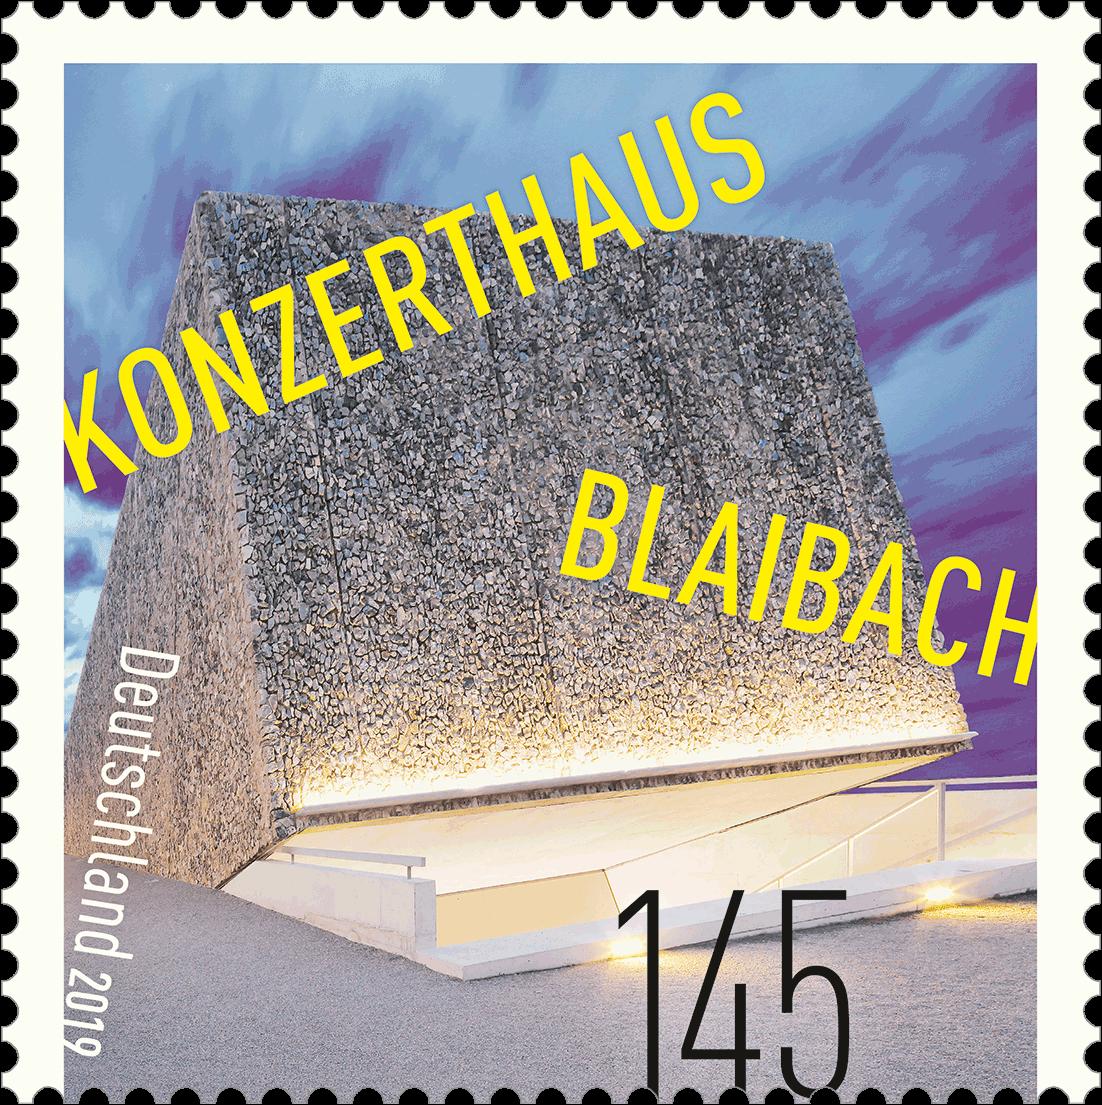 https://www.borek.de/briefmarke-konzerthaus-blaibach